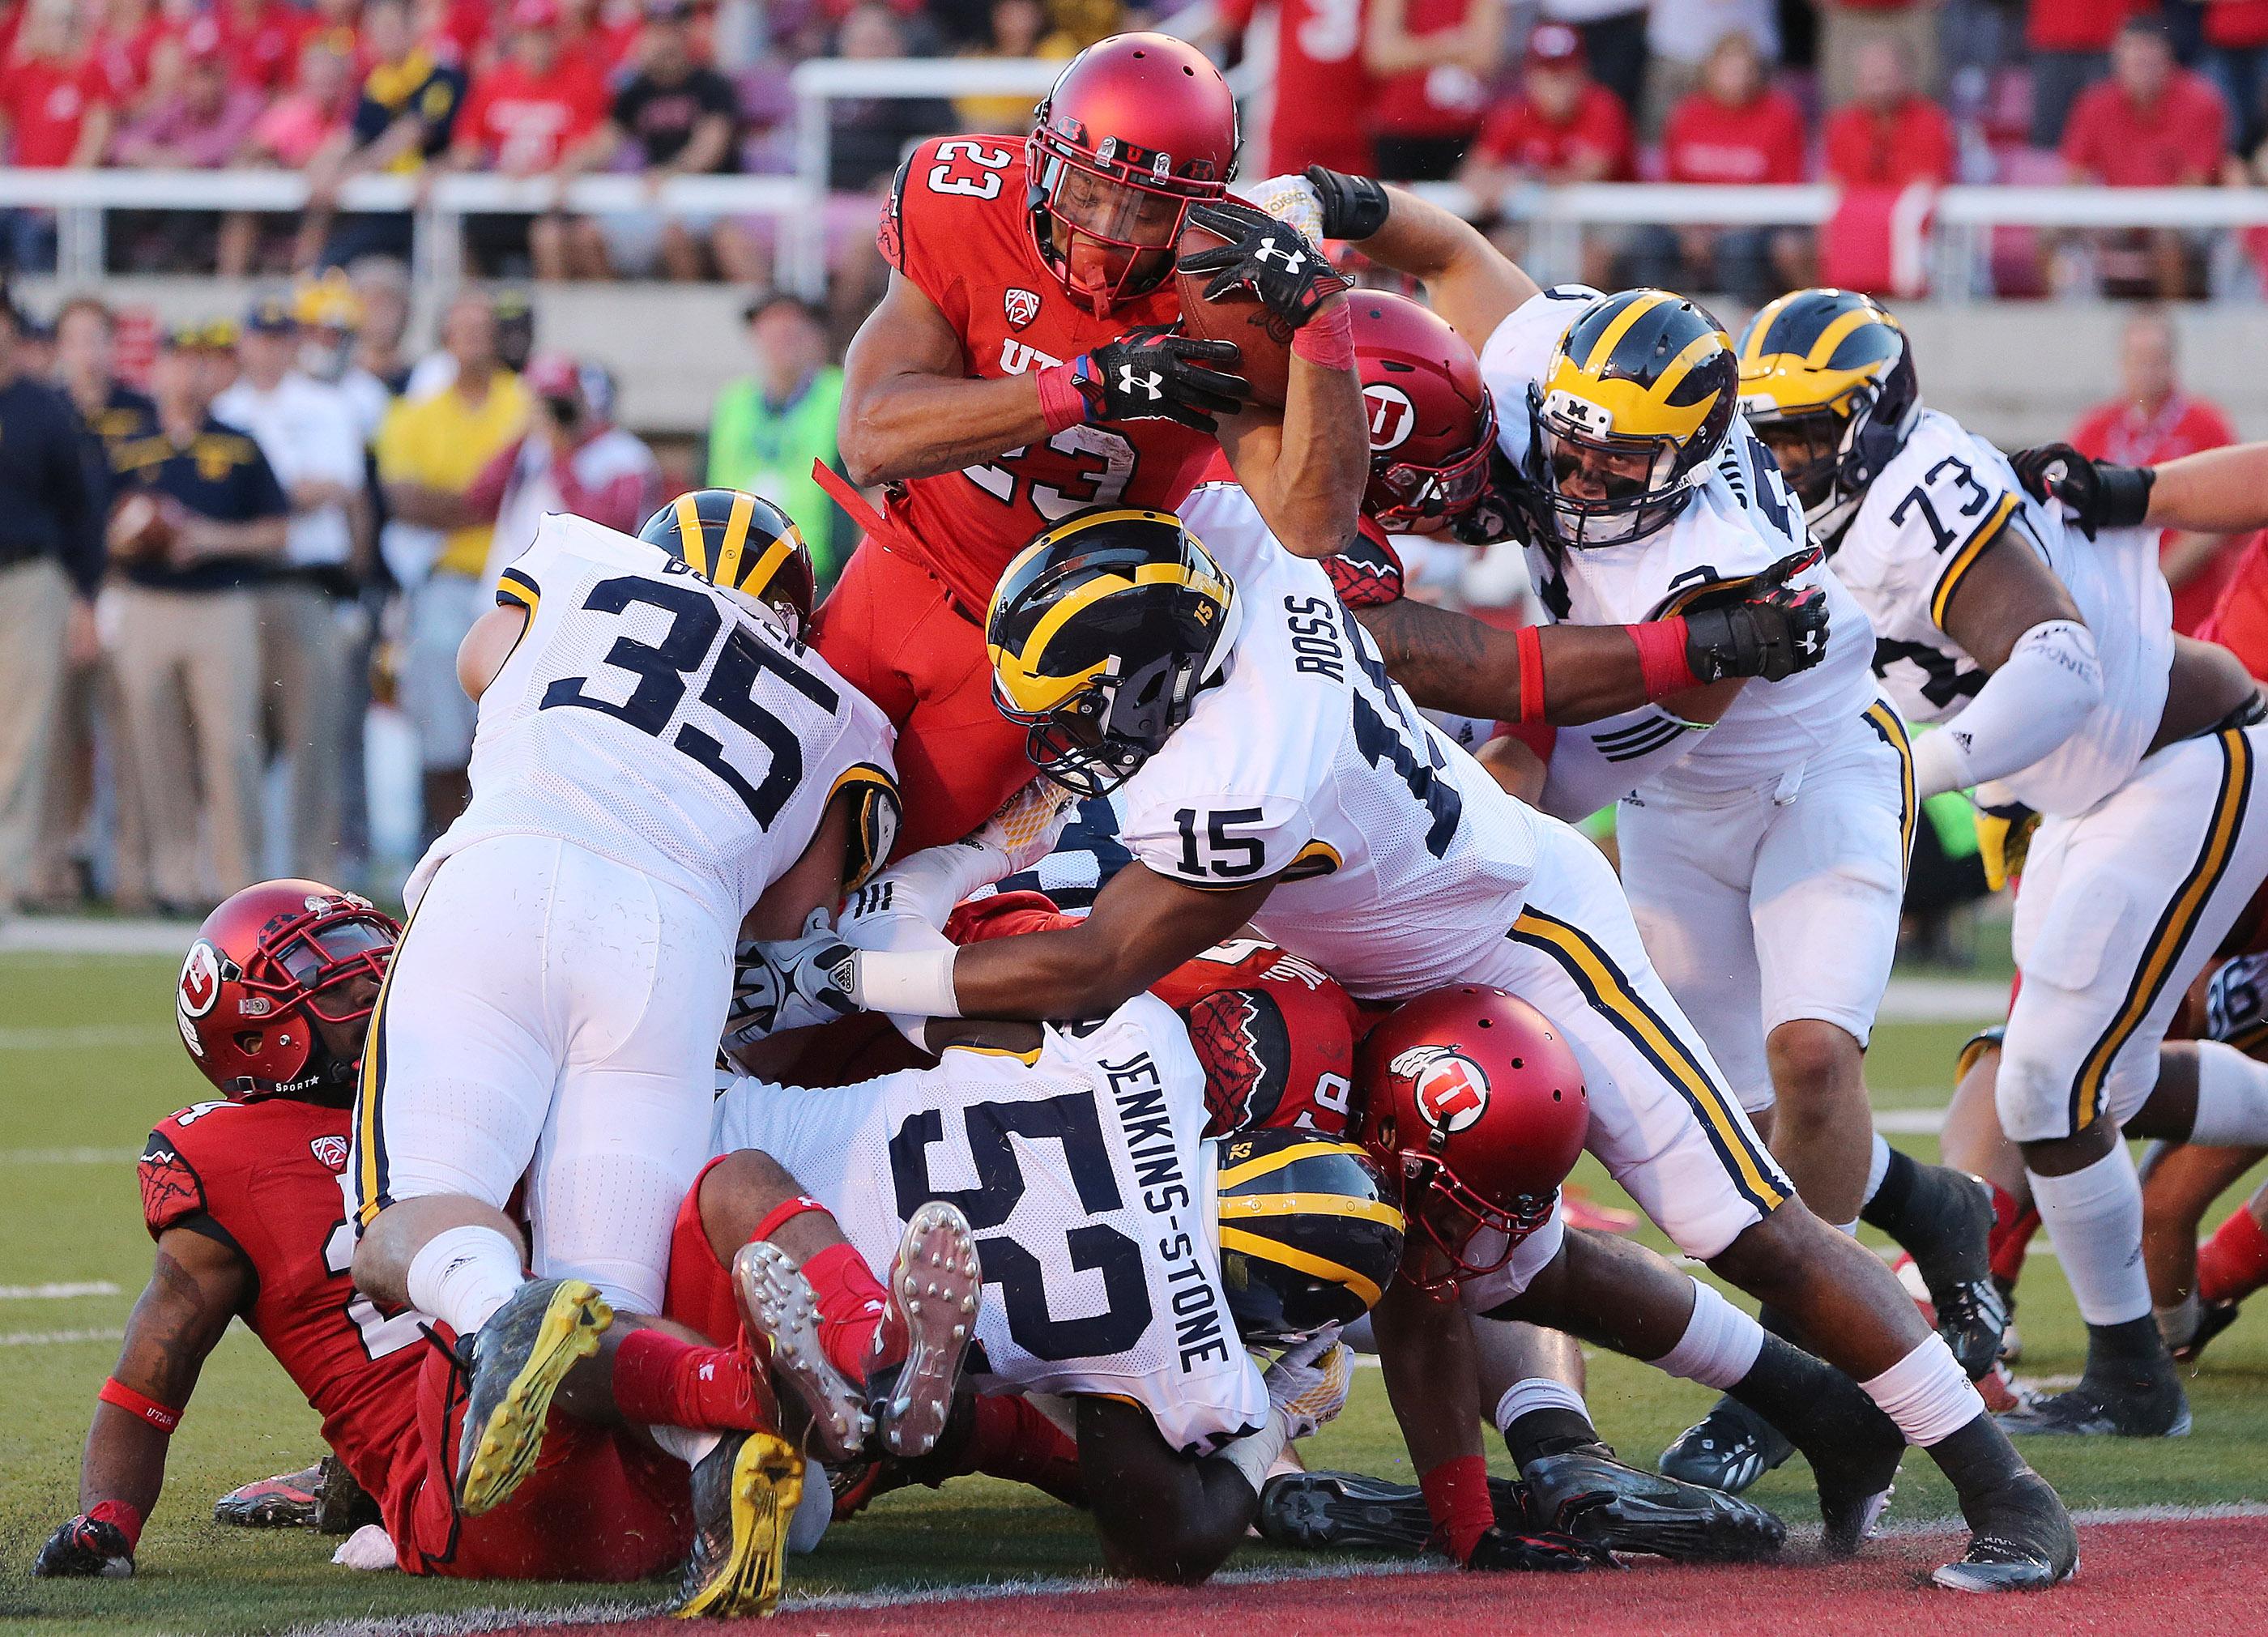 Utah Utes running back Devontae Booker (23) dives over Michigan for a touchdown.